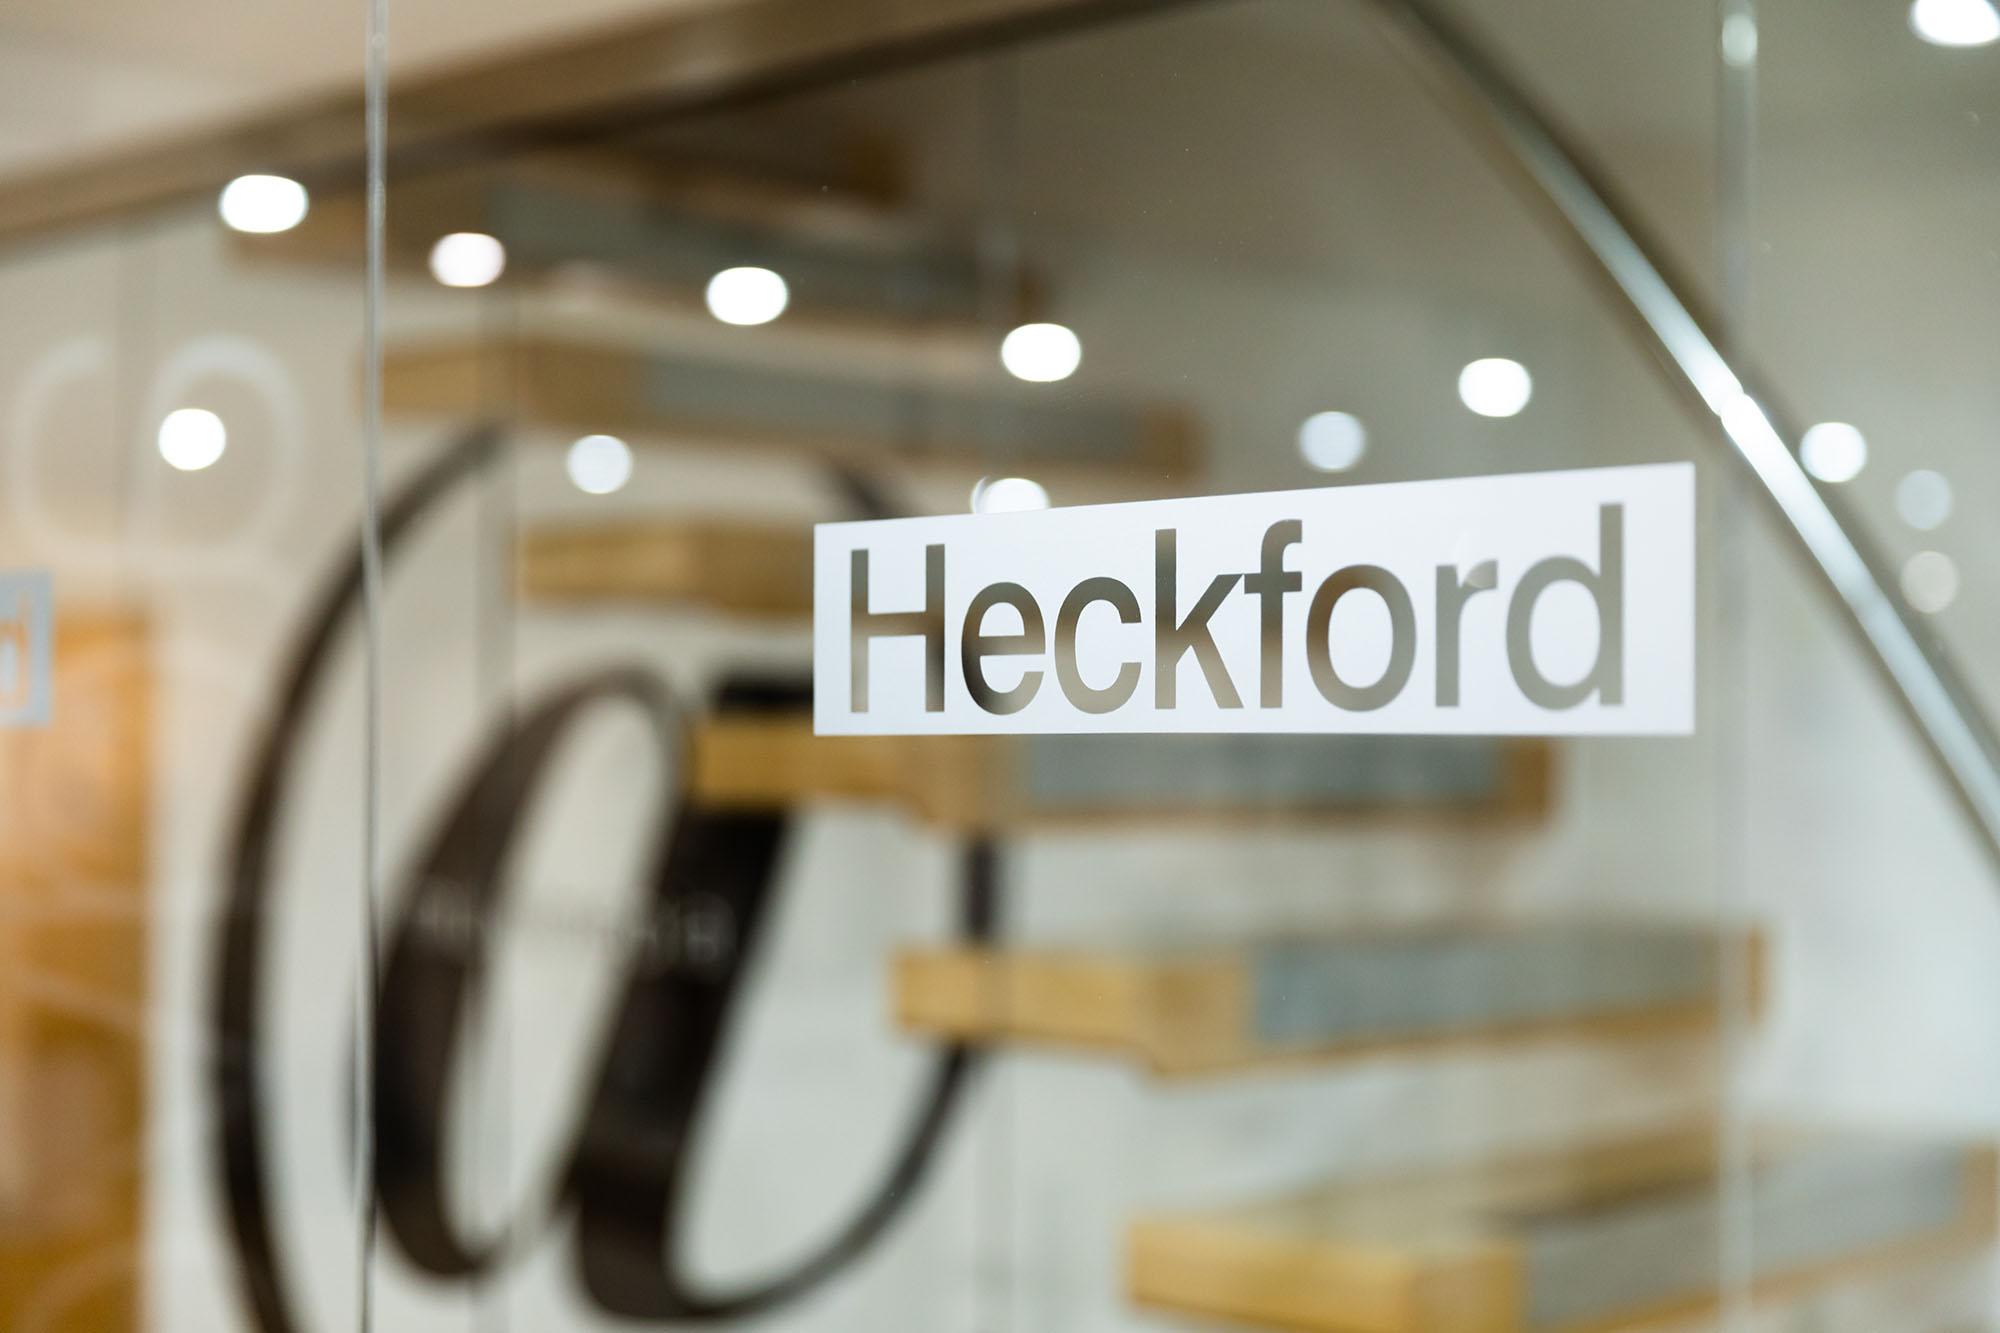 Heckford window graphic